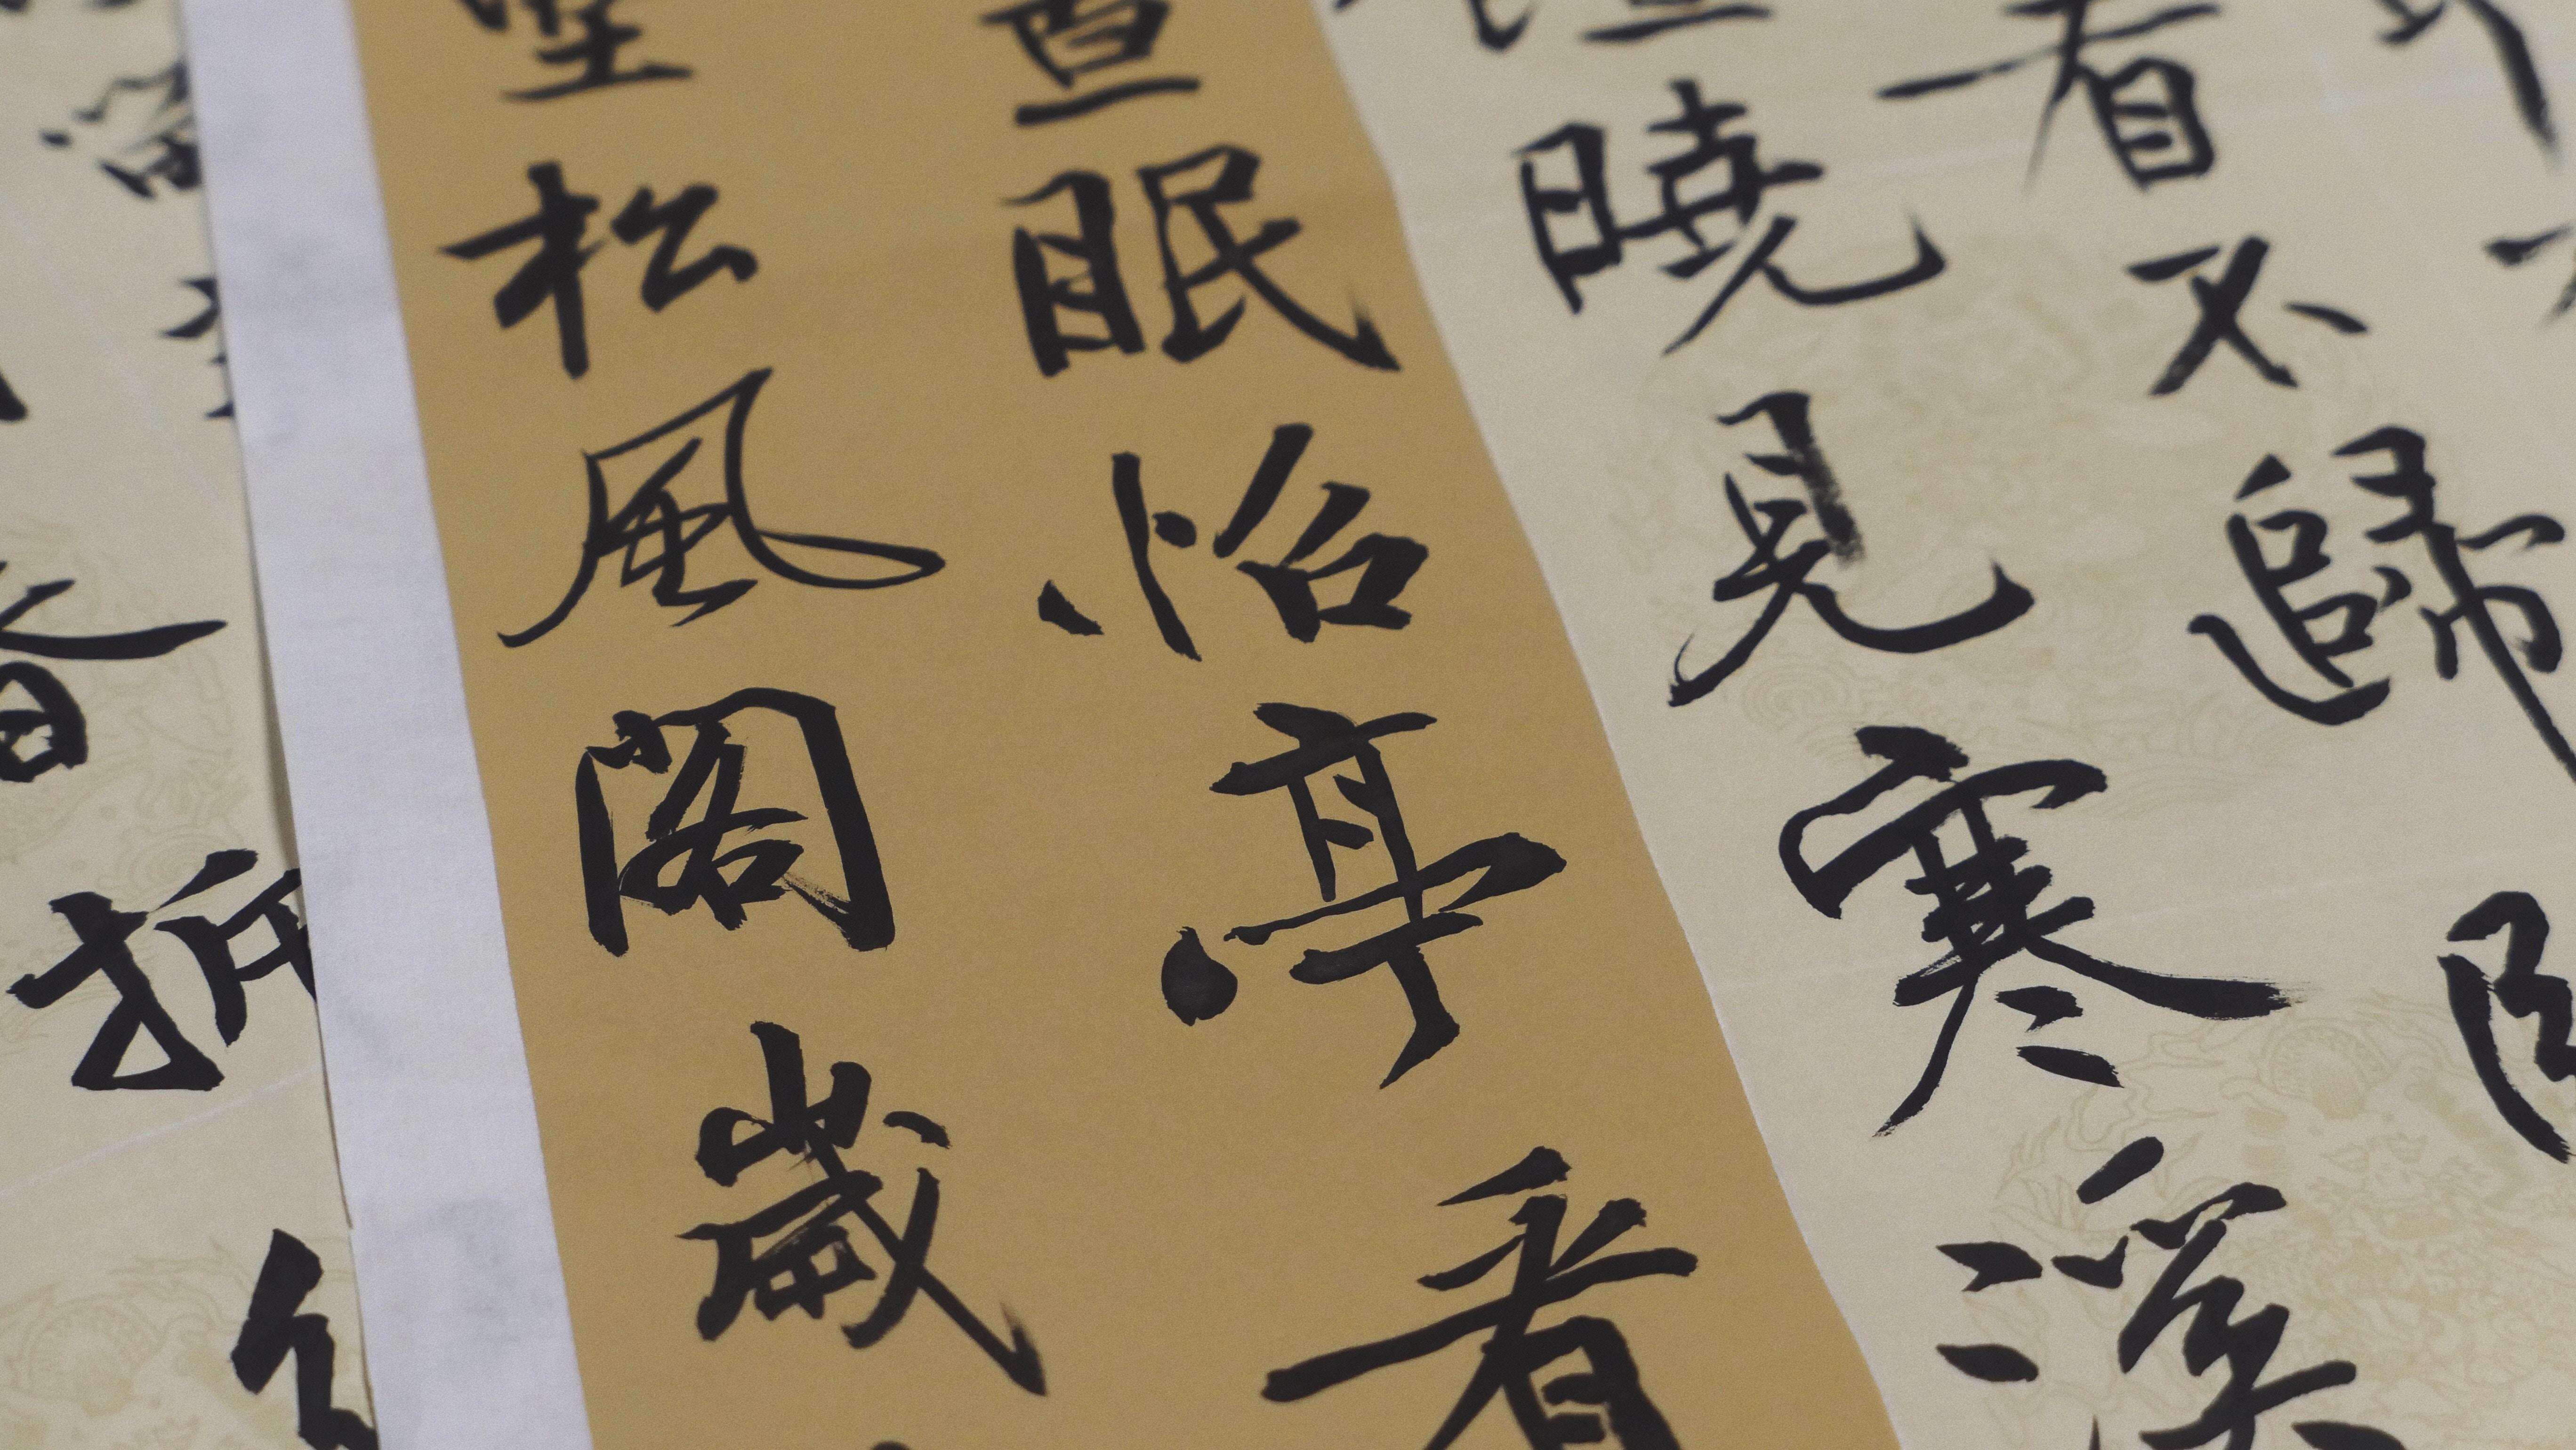 white and brown kanji text